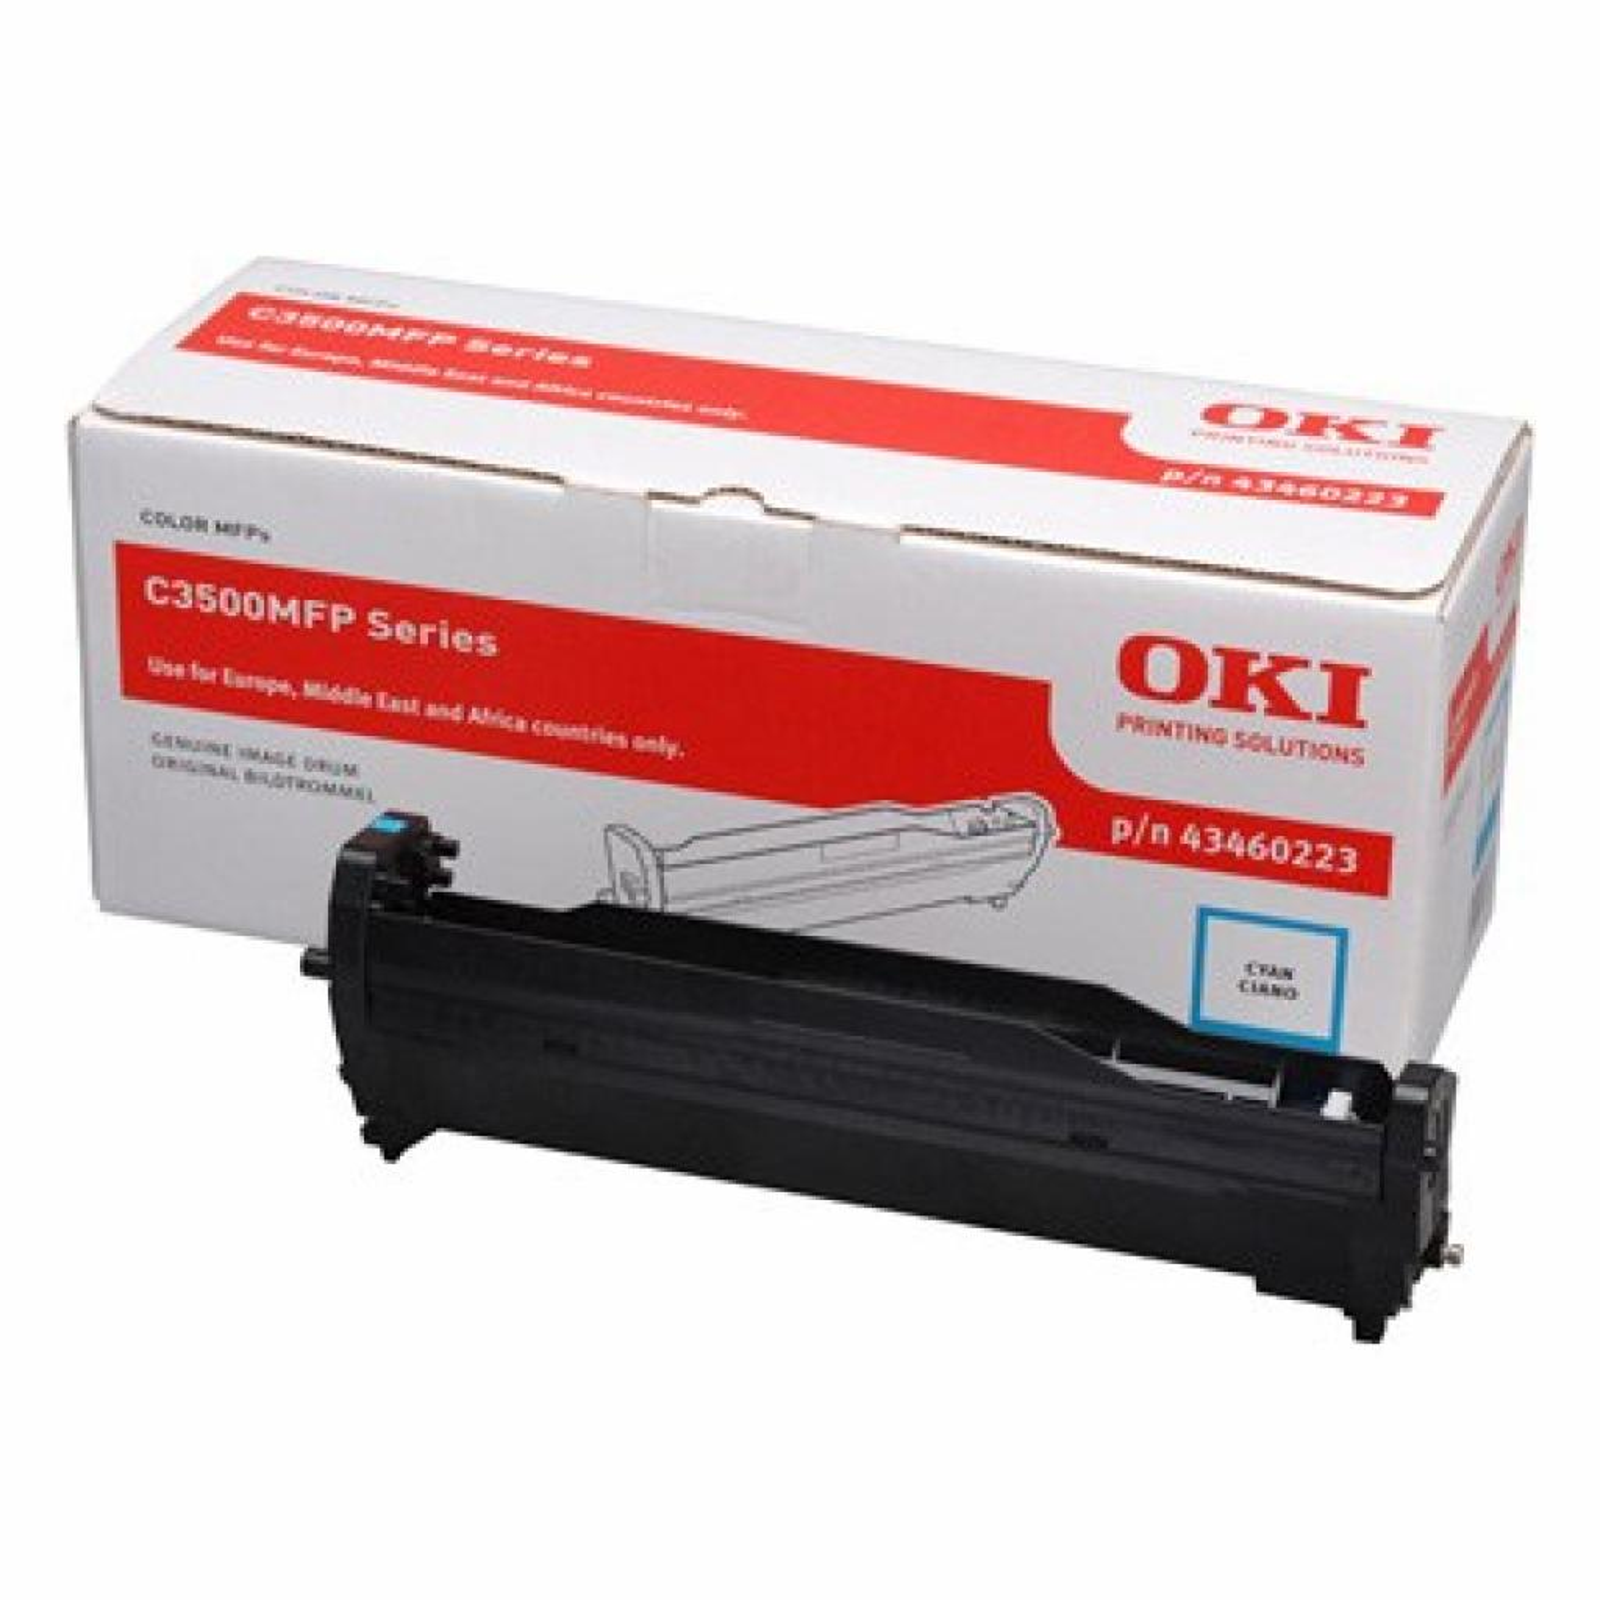 Фотокондуктор OKI C3520MFP/3530MFP/MC350/360 Cyan (43460223)